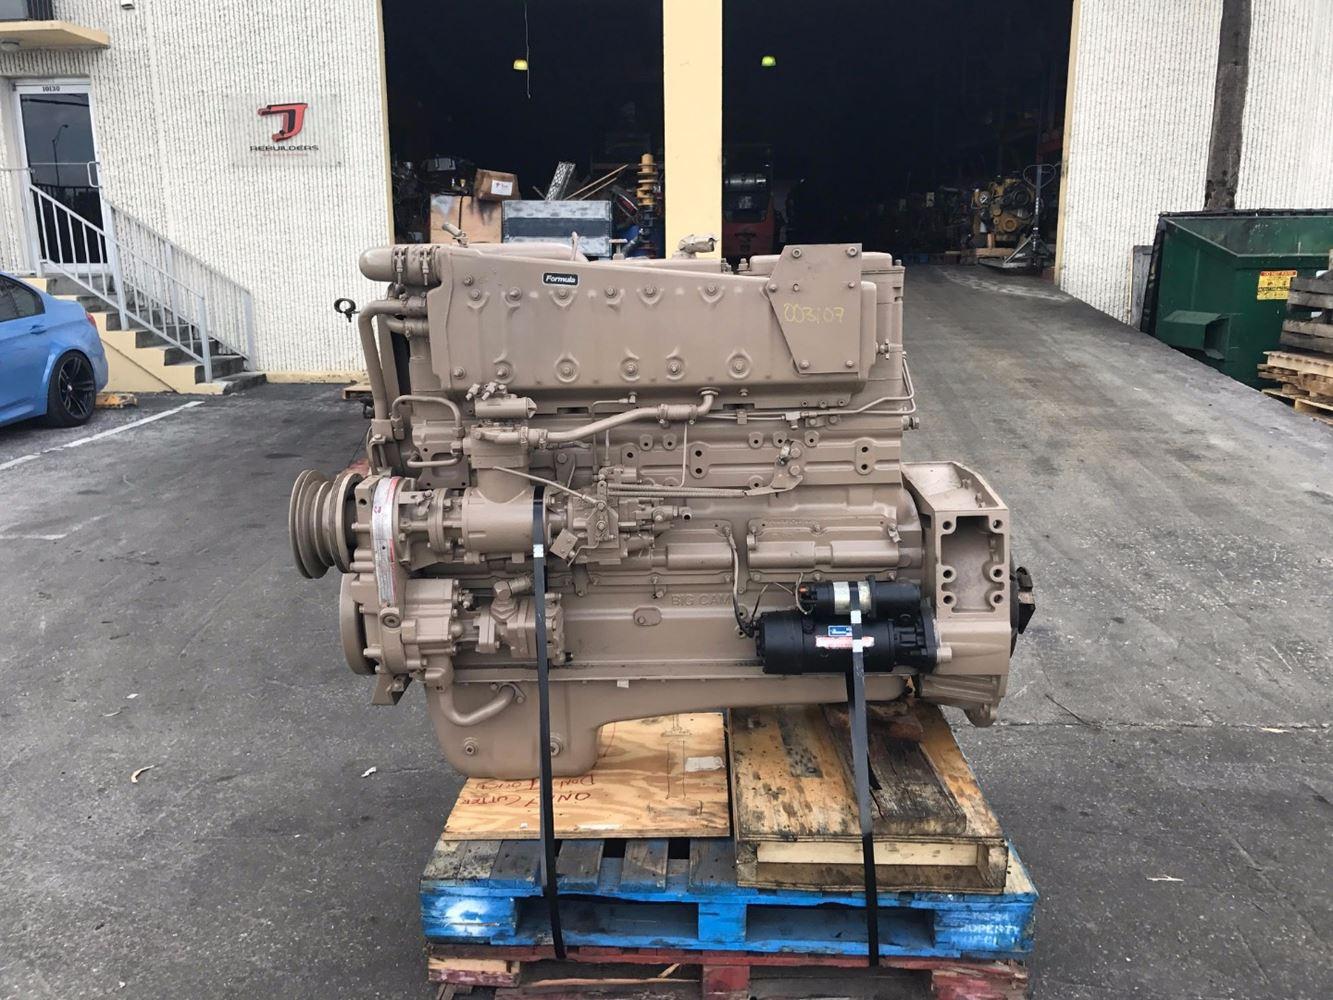 Used Cummins Engines For Sale >> Cummins NTC (Stock #003107)   Engine Assys   TPI